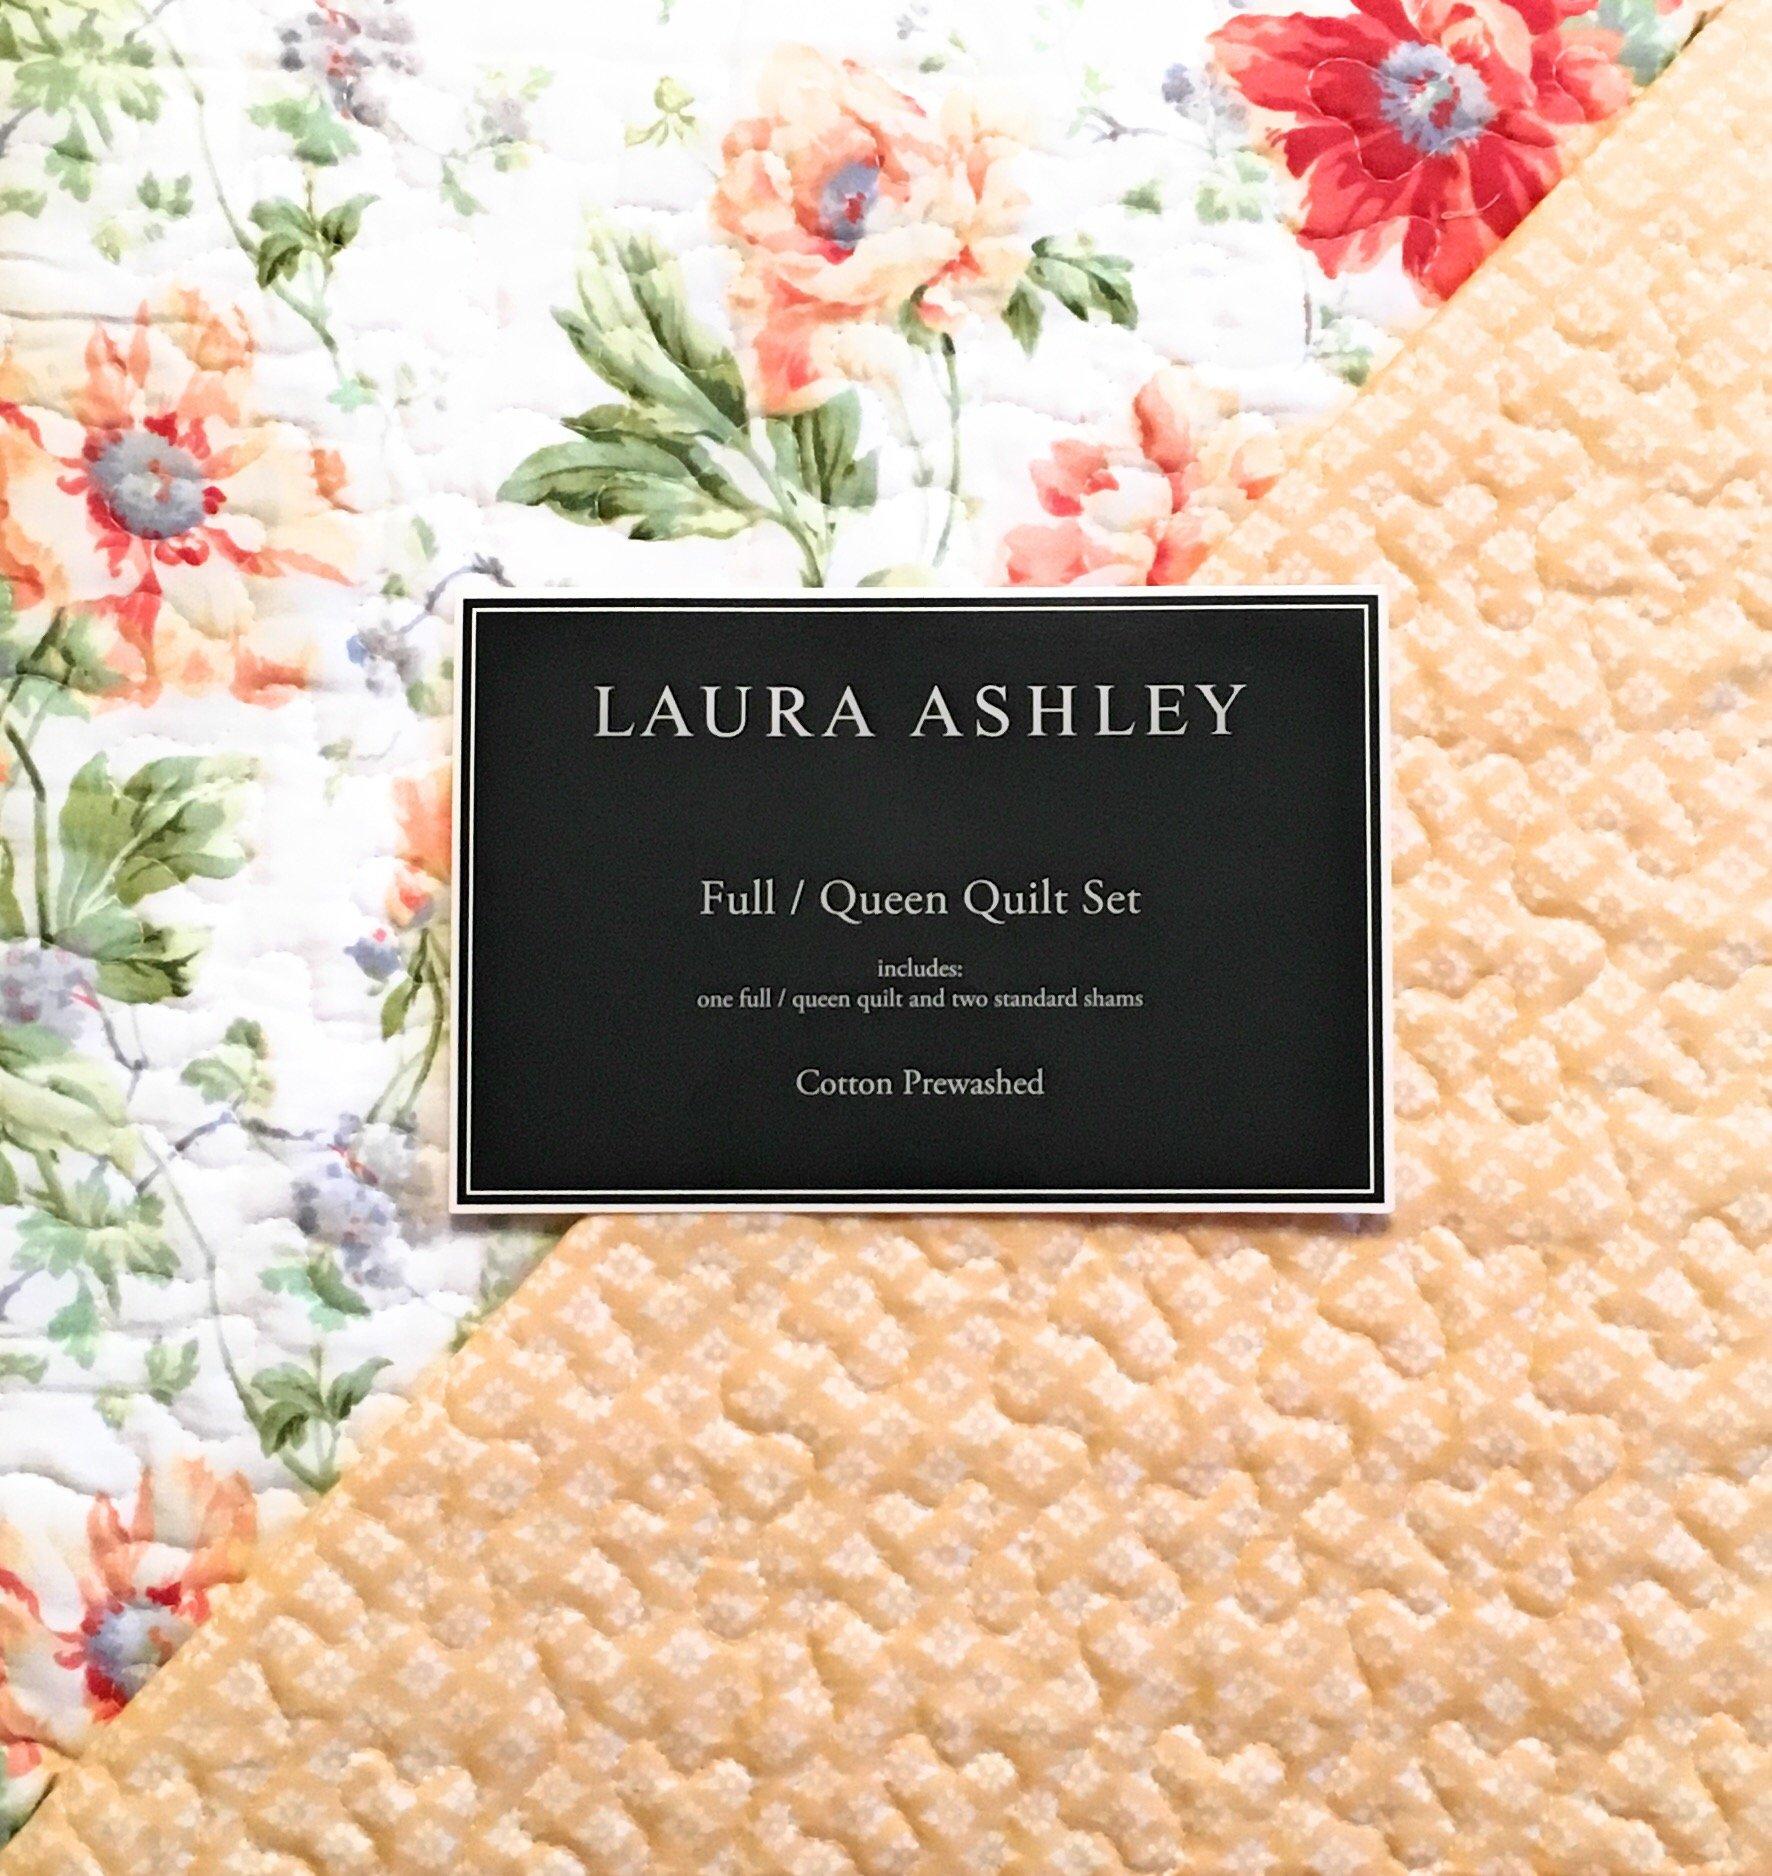 Laura Ashley Full/Queen Quilt Set